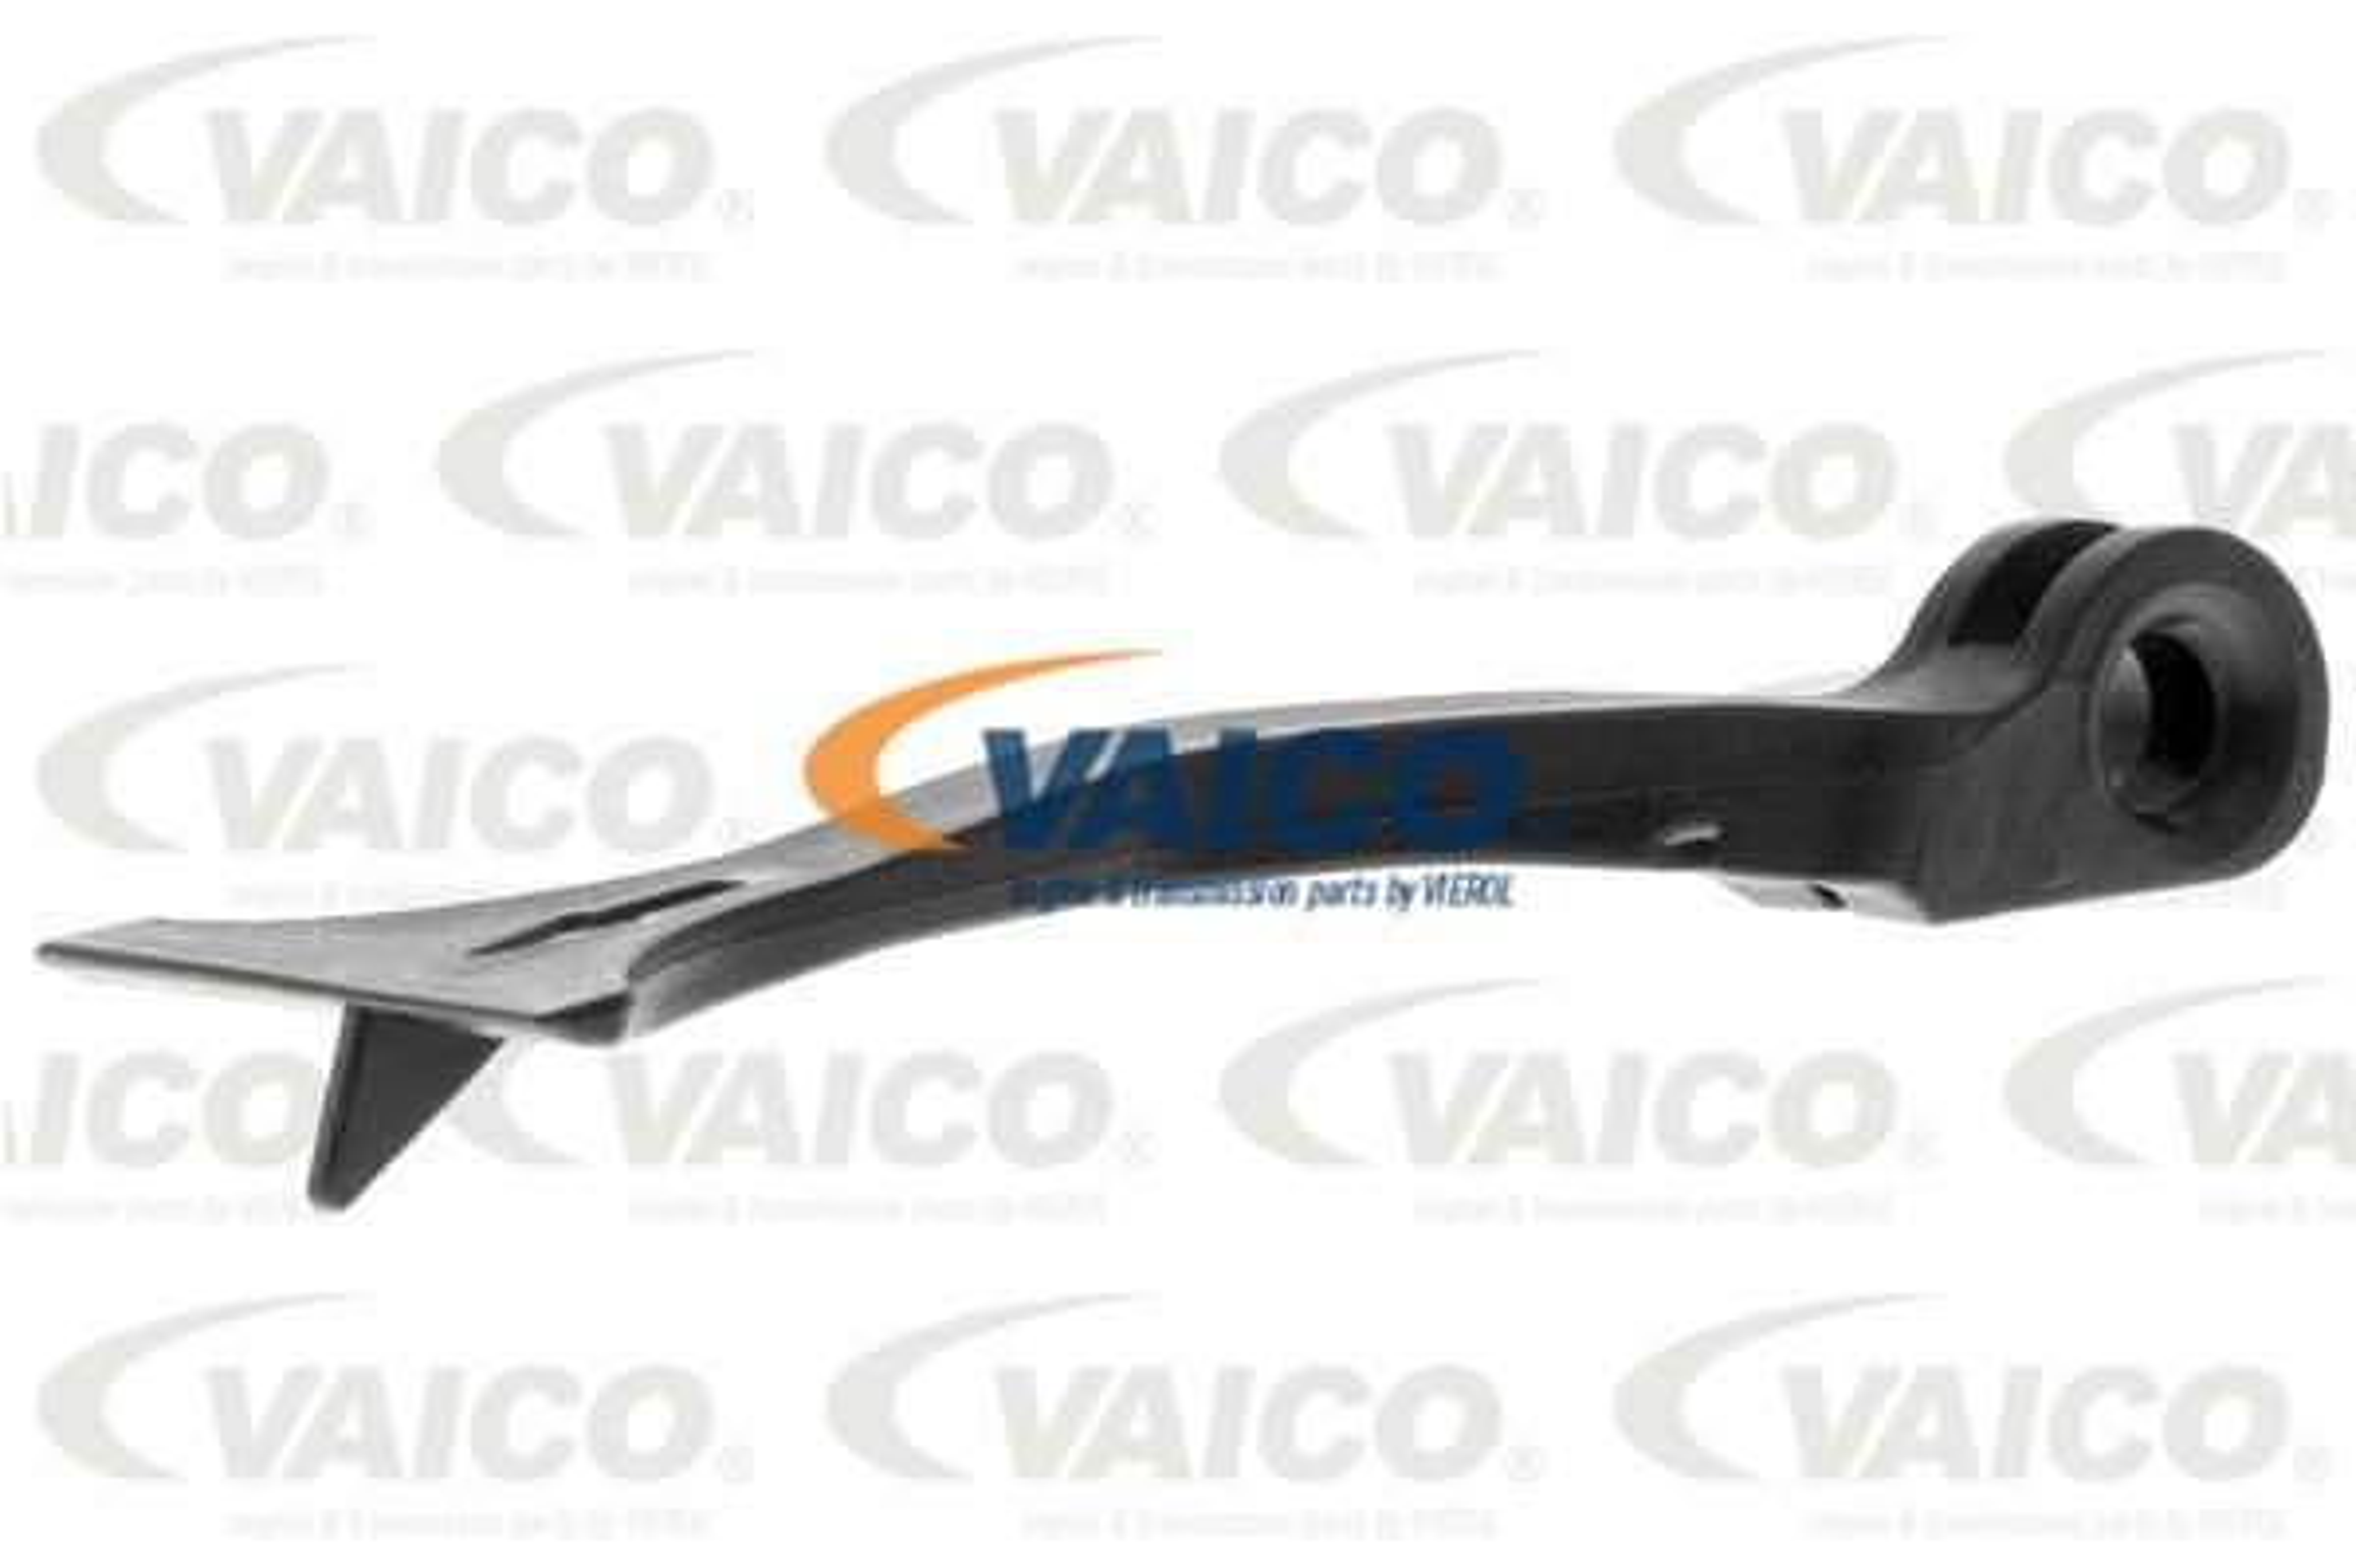 MERCEDES-BENZ E-Klasse 2009 Türgriff - Original VAICO V30-1593